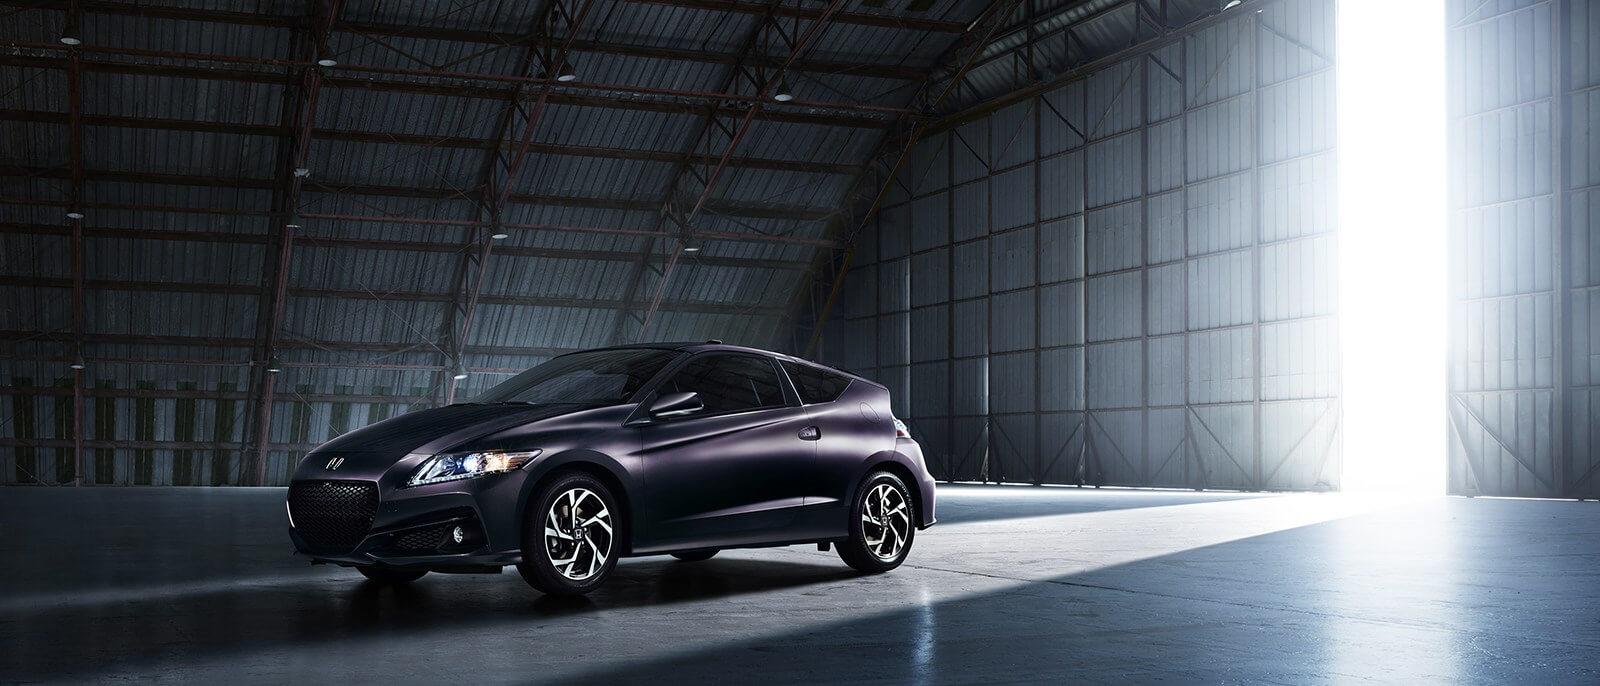 2016 Honda CR-Z side view